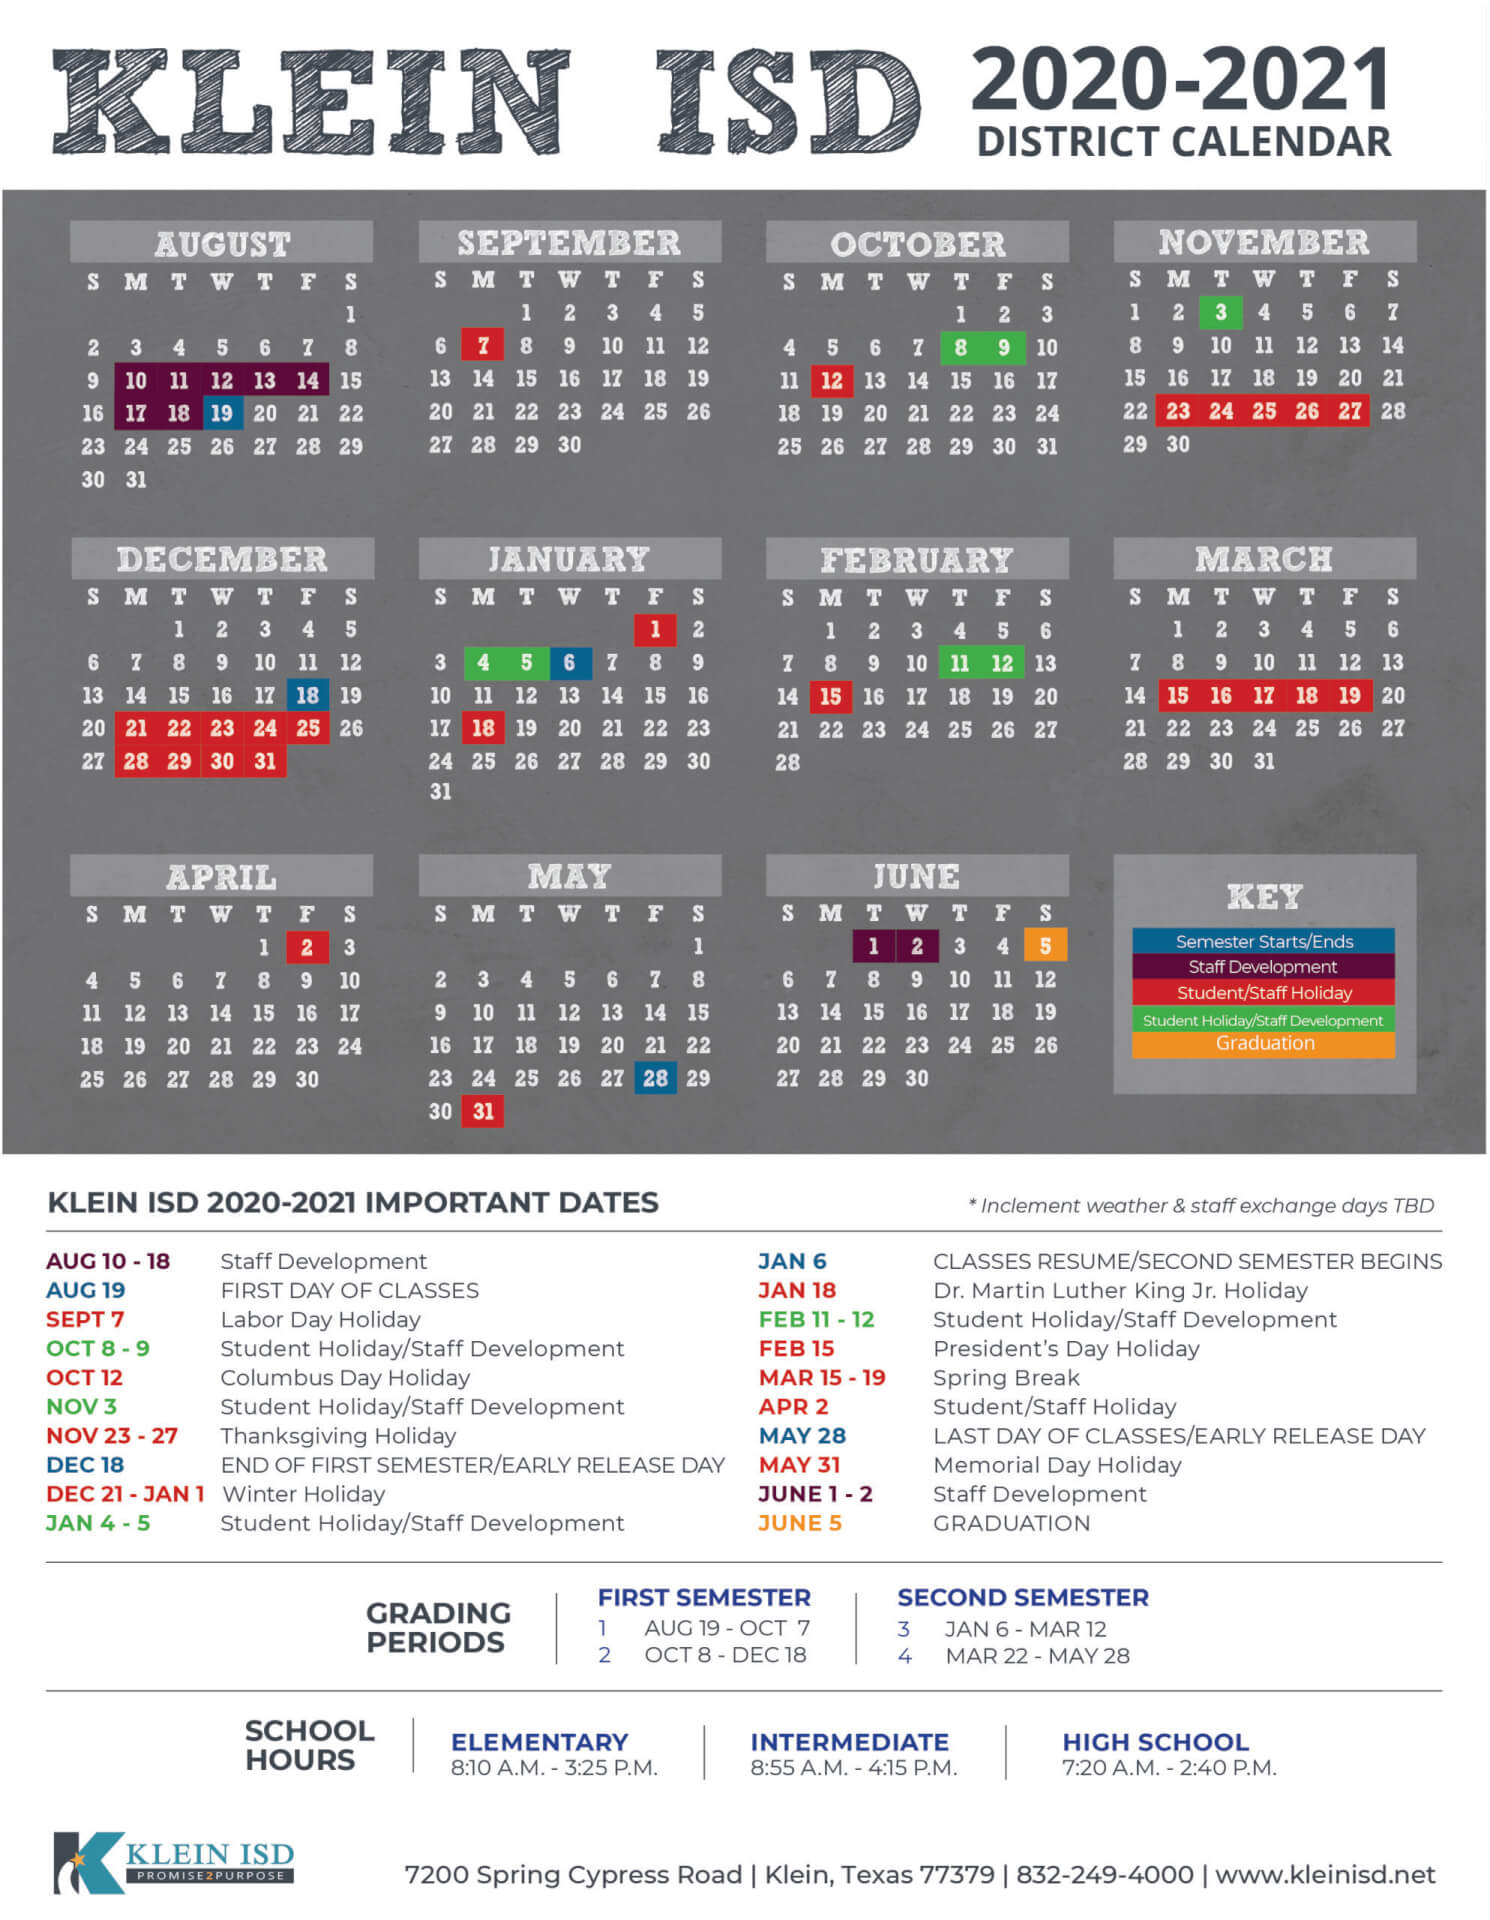 Klein Isd Announces Calendar For 2020 2021 School Year Pertaining To University Of Houston 2021 2021 Calendar